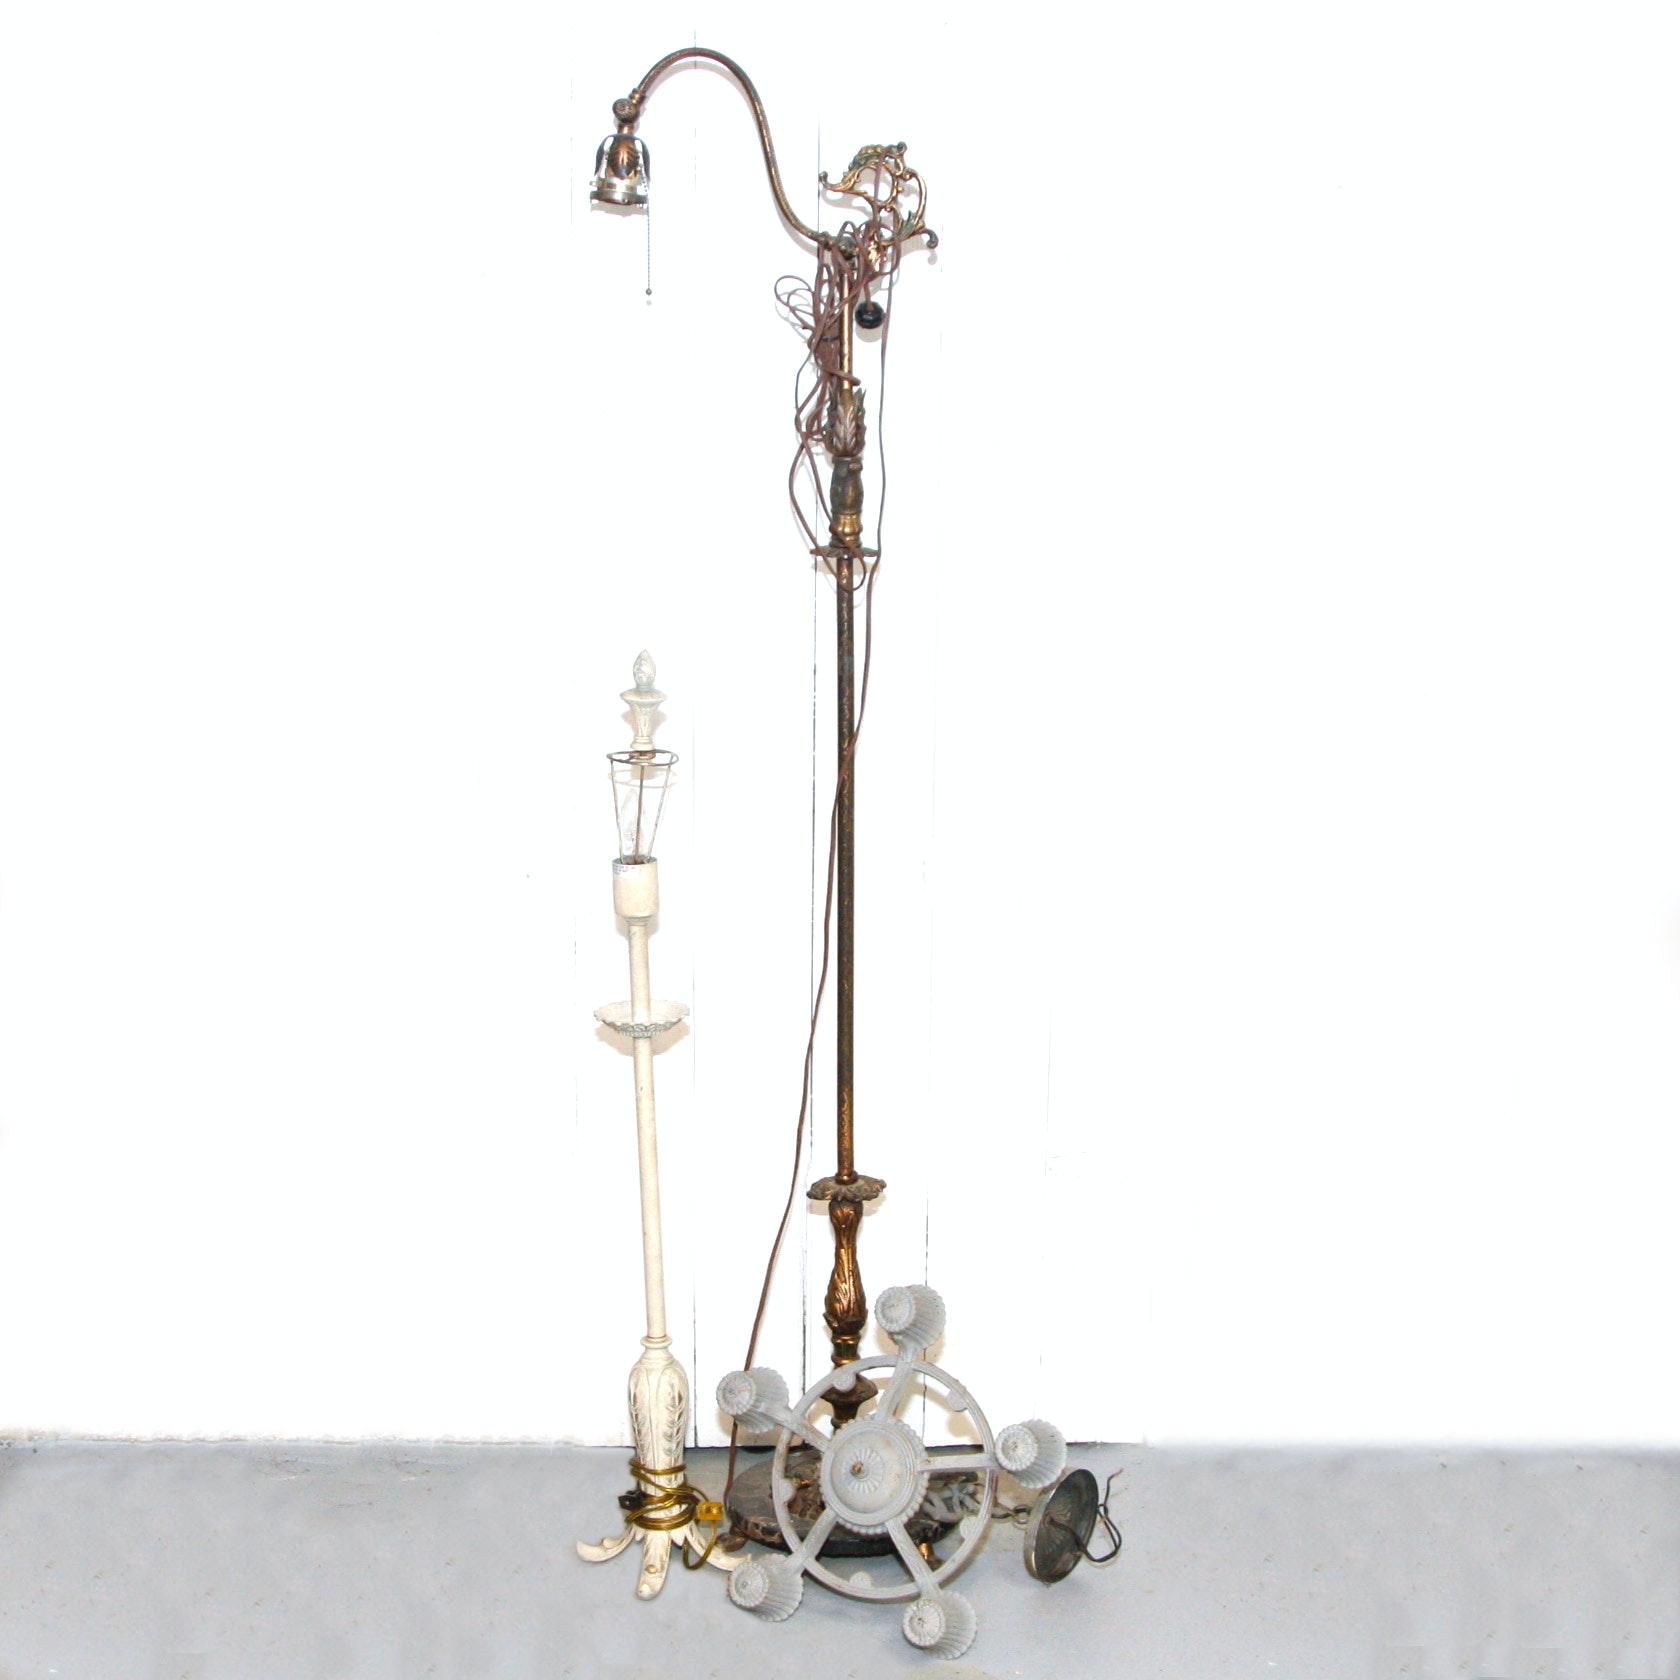 Three Antique to Vintage Cast Metal Lighting Fixtures